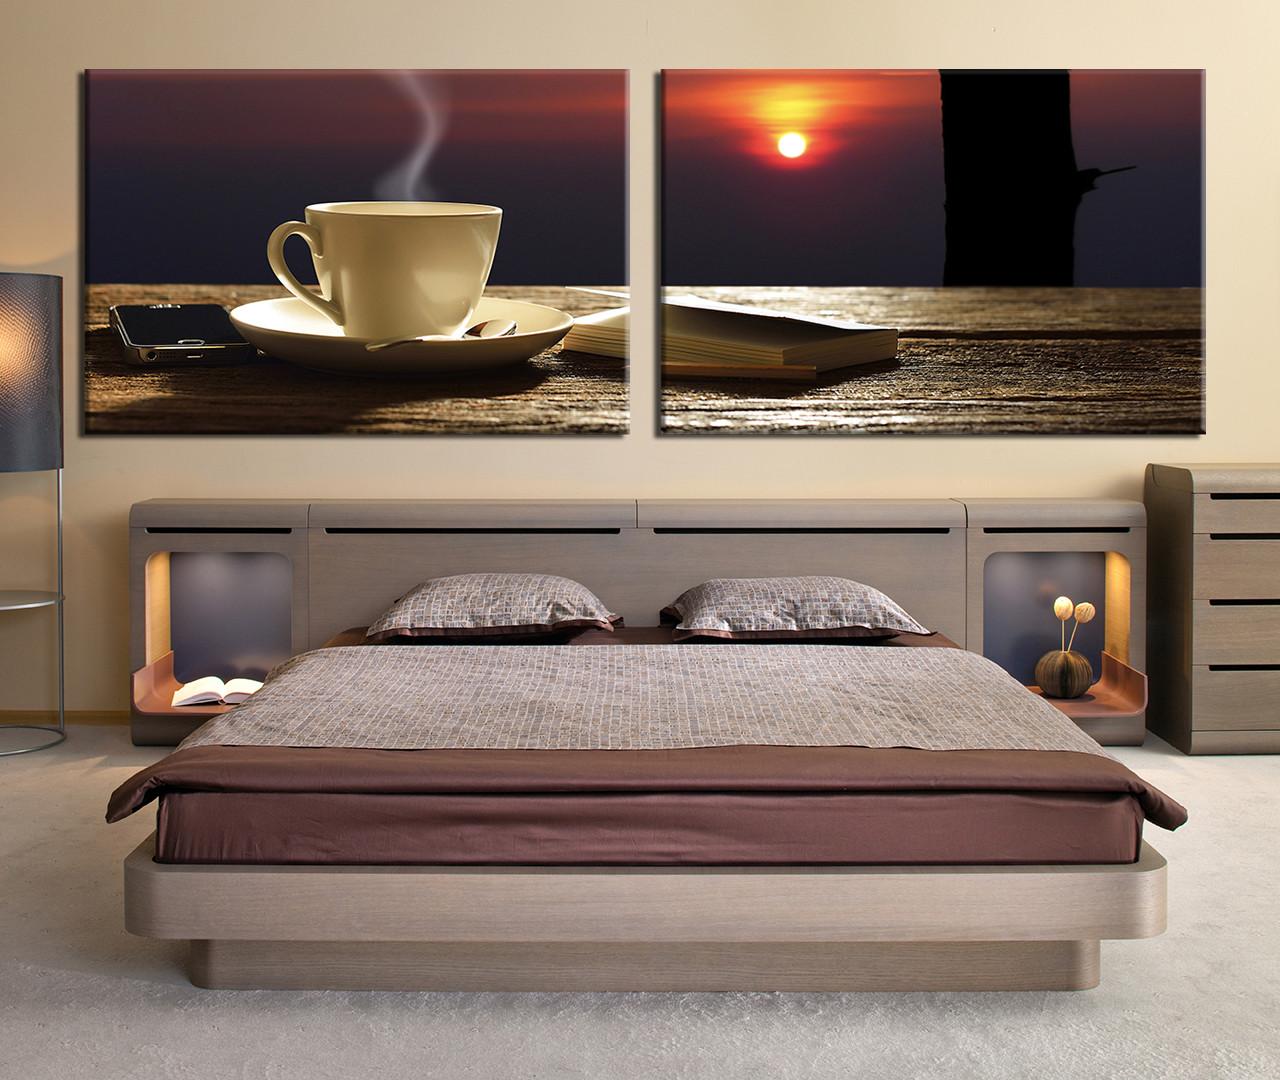 Bedroom Decor, 2 Piece Wall Art, Coffee Beans Canvas Art Prints, Kitchen  Multi